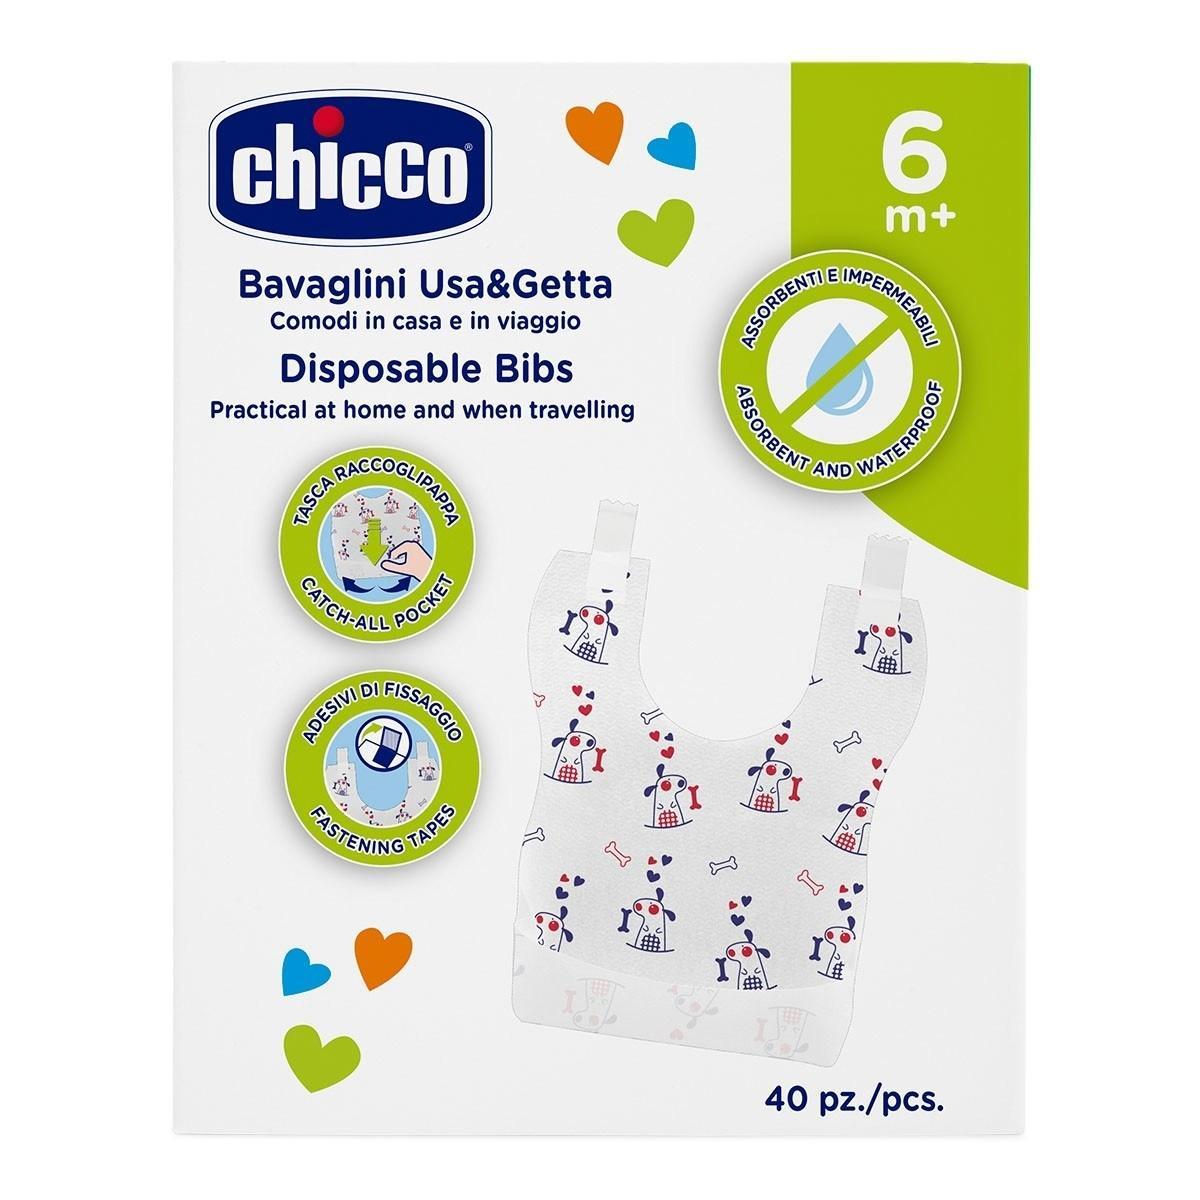 Нагрудники одноразовые Chicco, 40 шт, 6 мес+